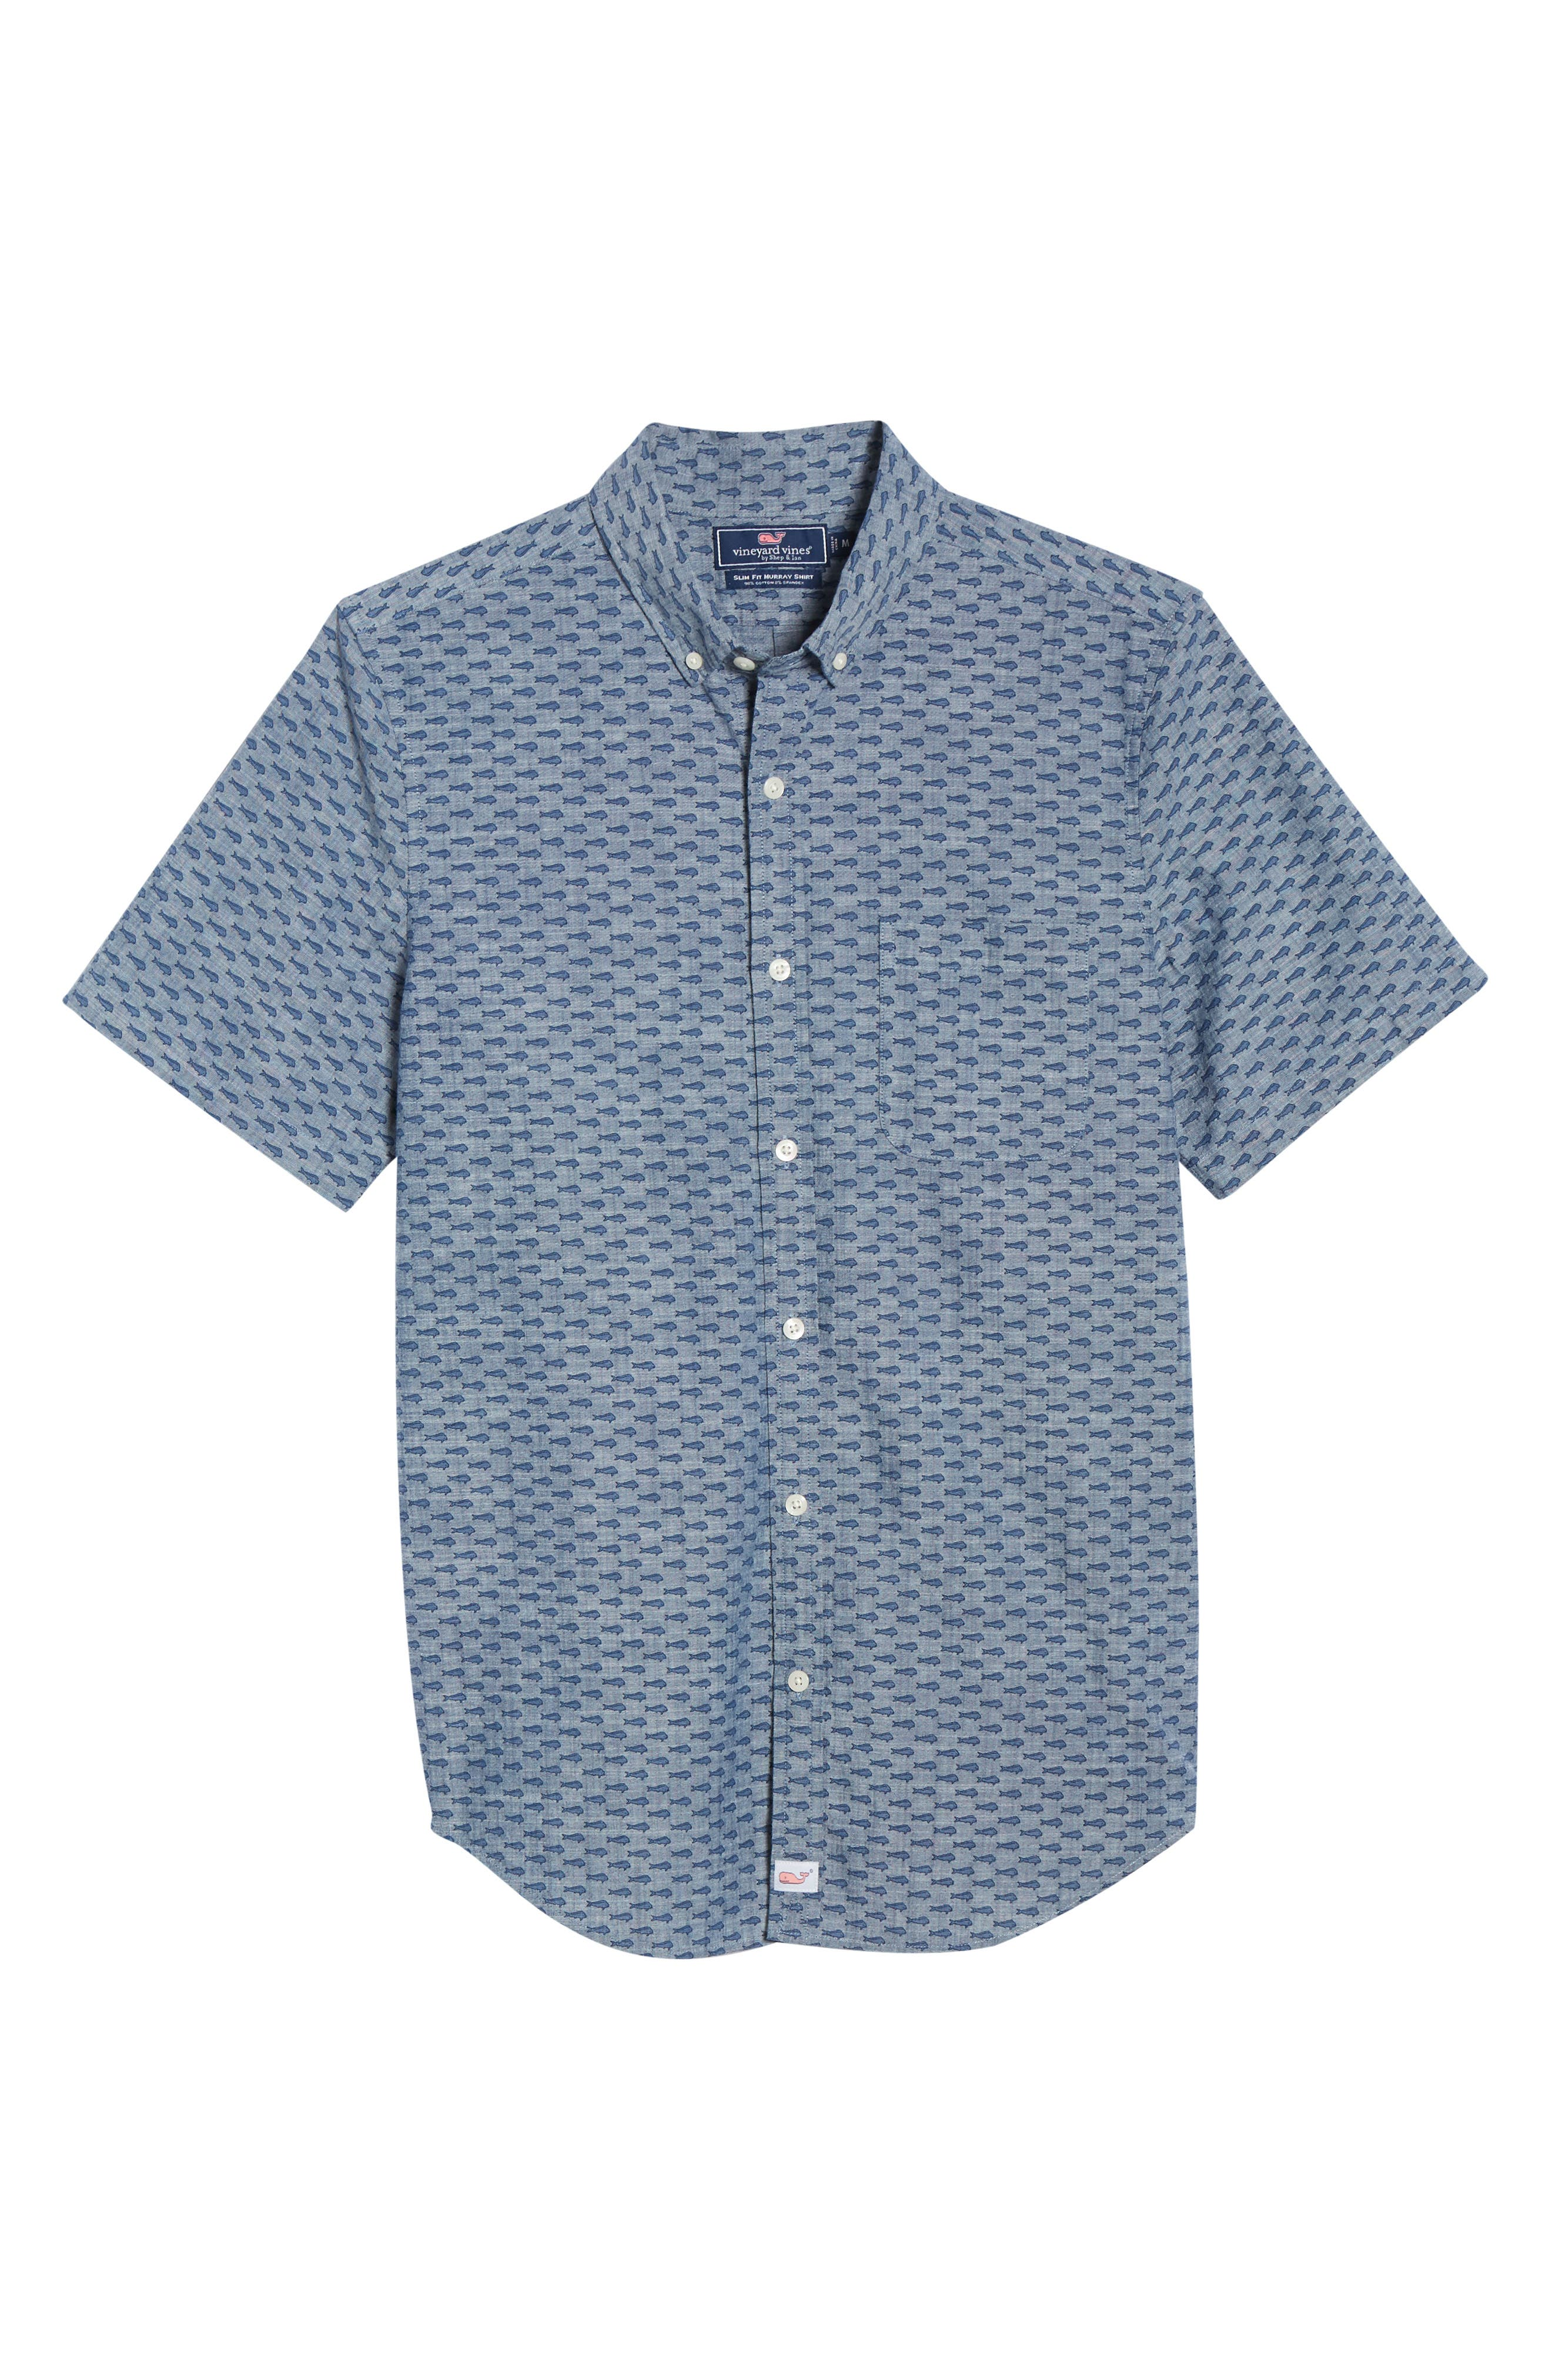 VINEYARD VINES,                             Murray Slim Fit Sport Shirt,                             Alternate thumbnail 5, color,                             SKYFALL